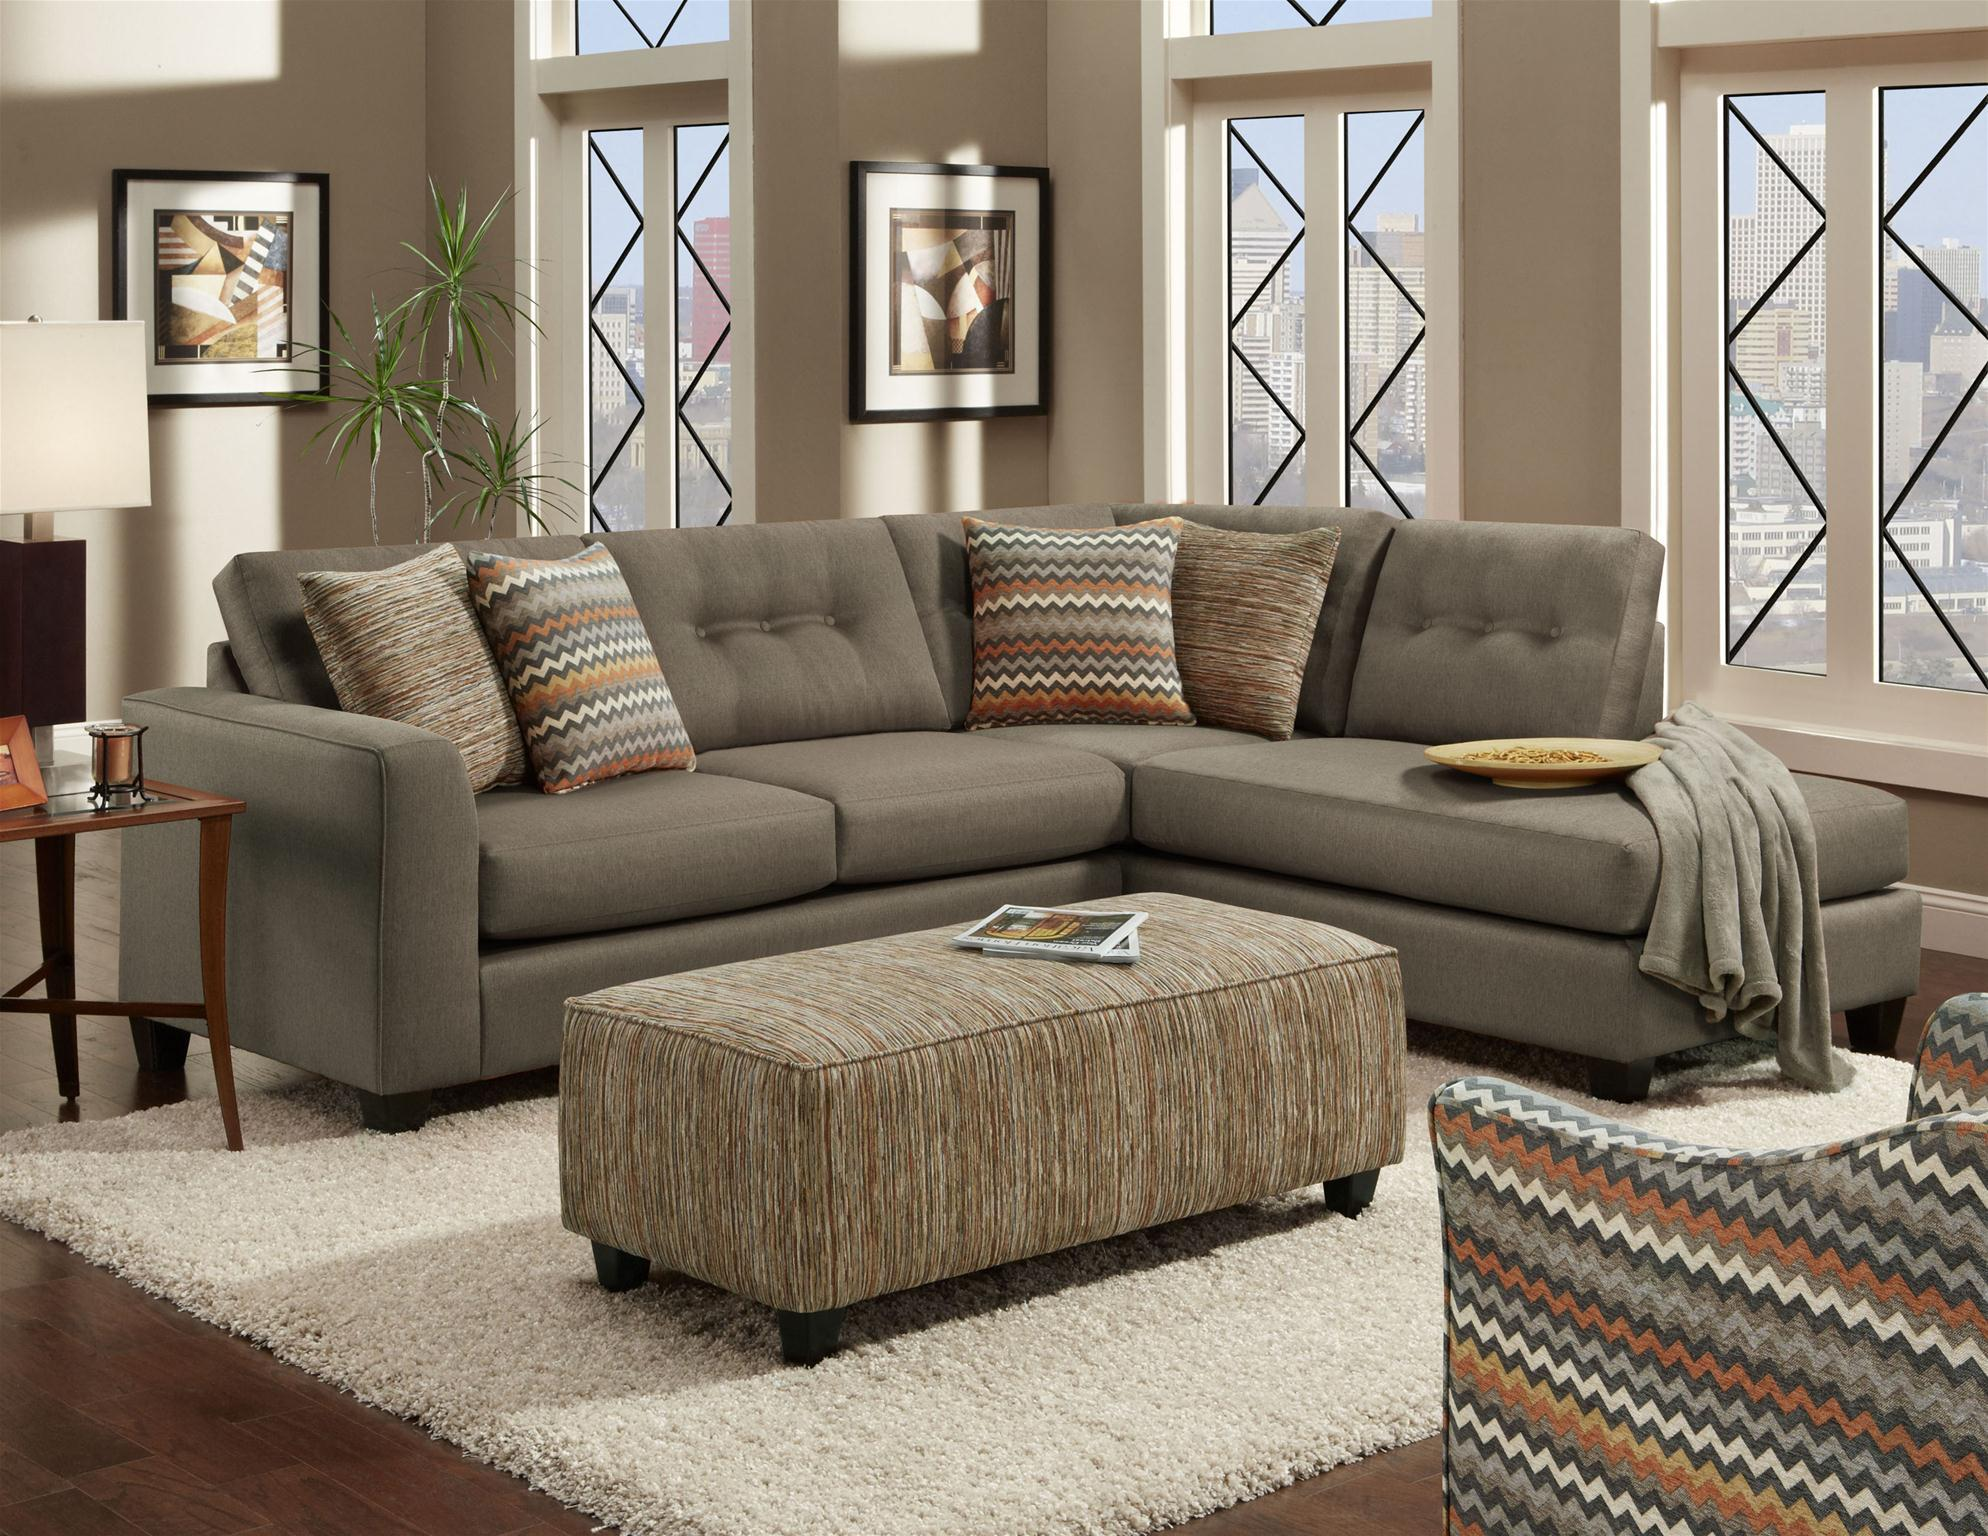 Fusion furniture fandango mocha stationary living room for Living room furniture groups